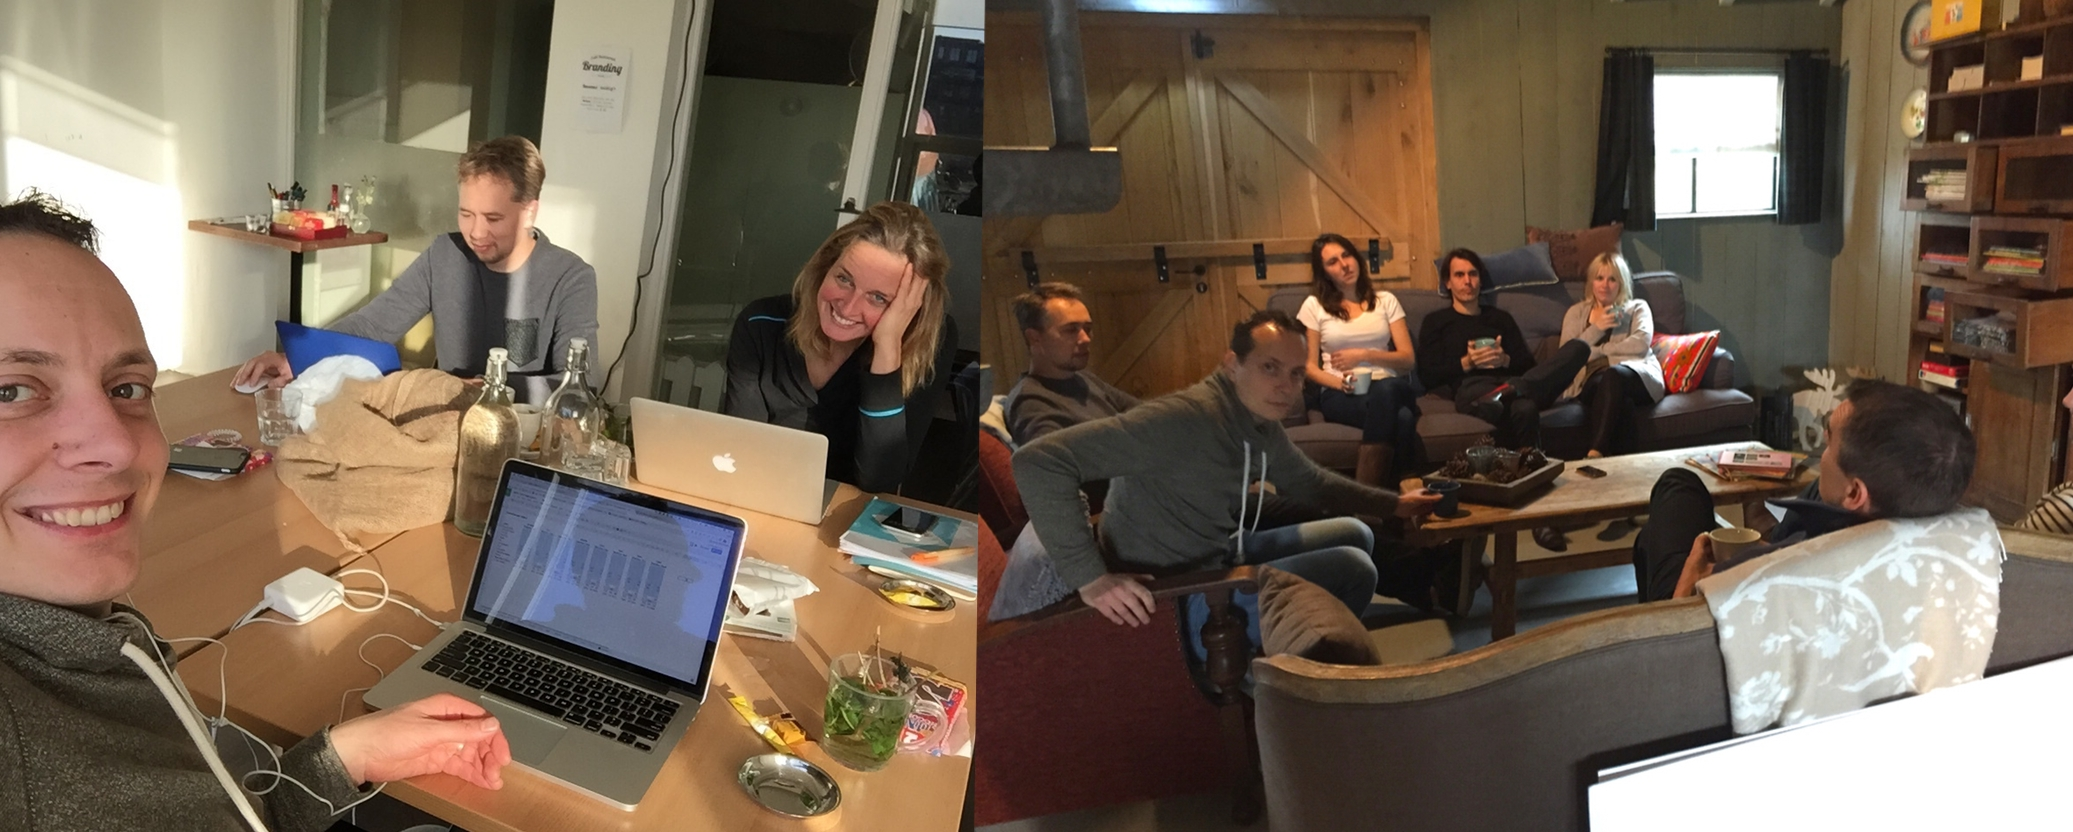 samenwerkdag-tribe-space-holacracy-energized.org